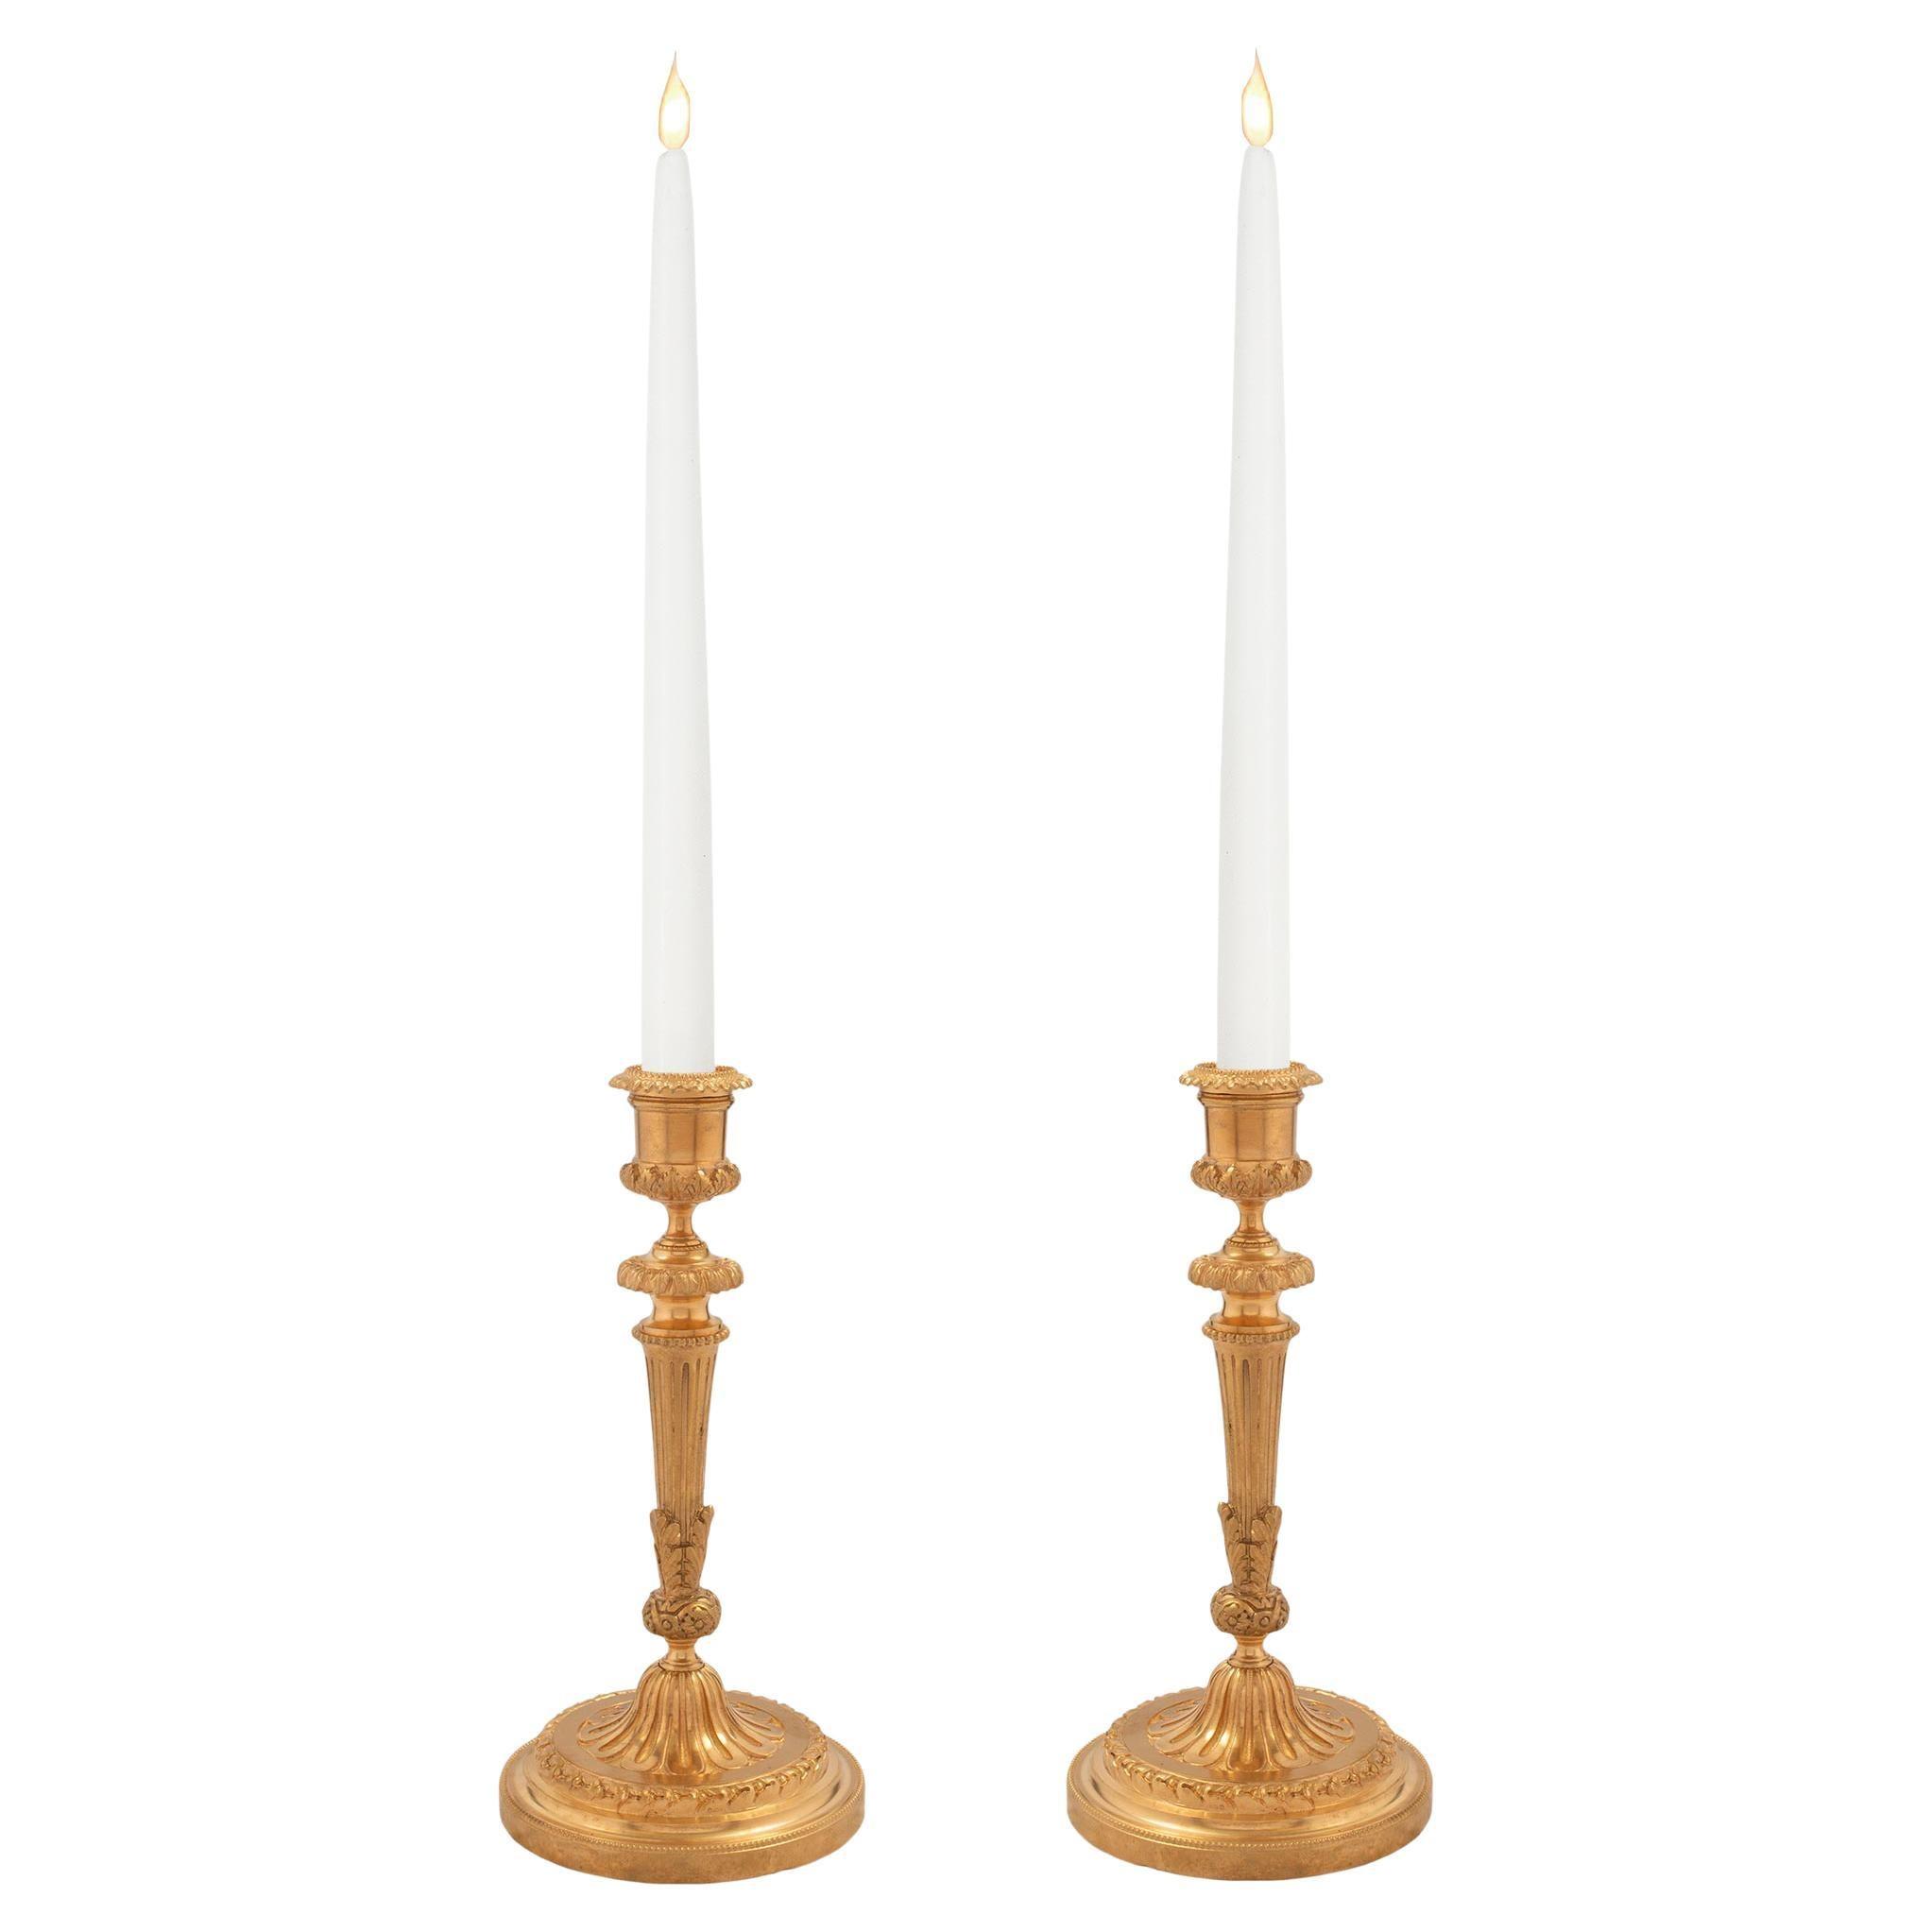 Pair of French Mid 19th Century Louis XVI St. Ormolu Candlesticks